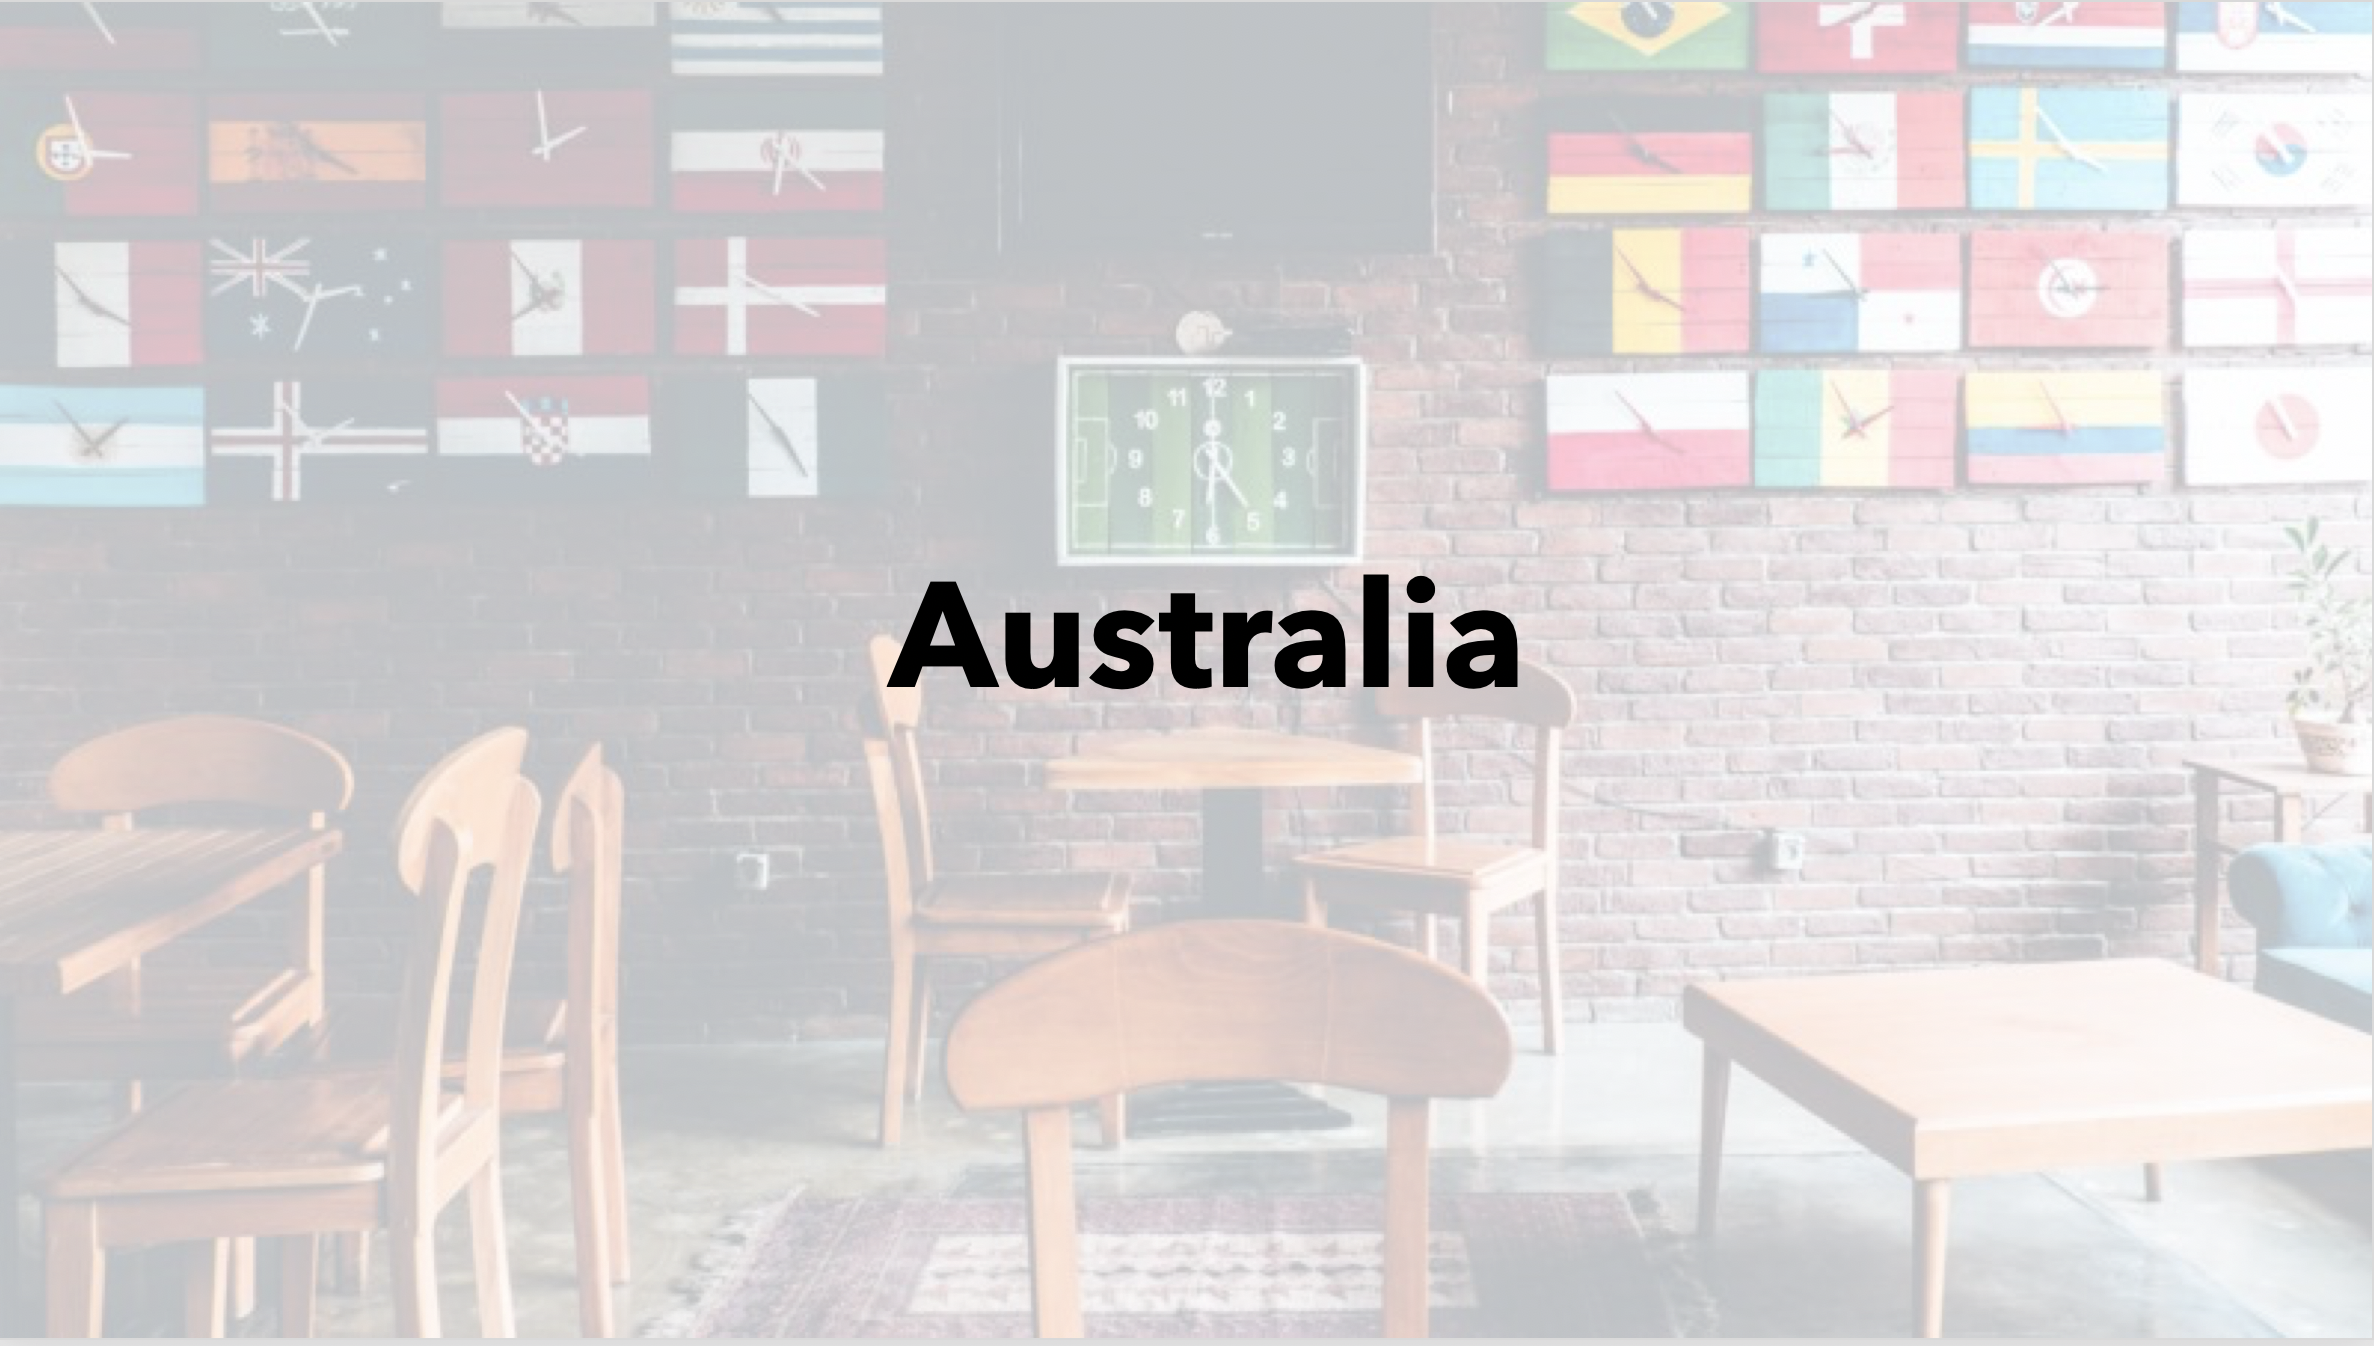 Australia with Beautiful Minds